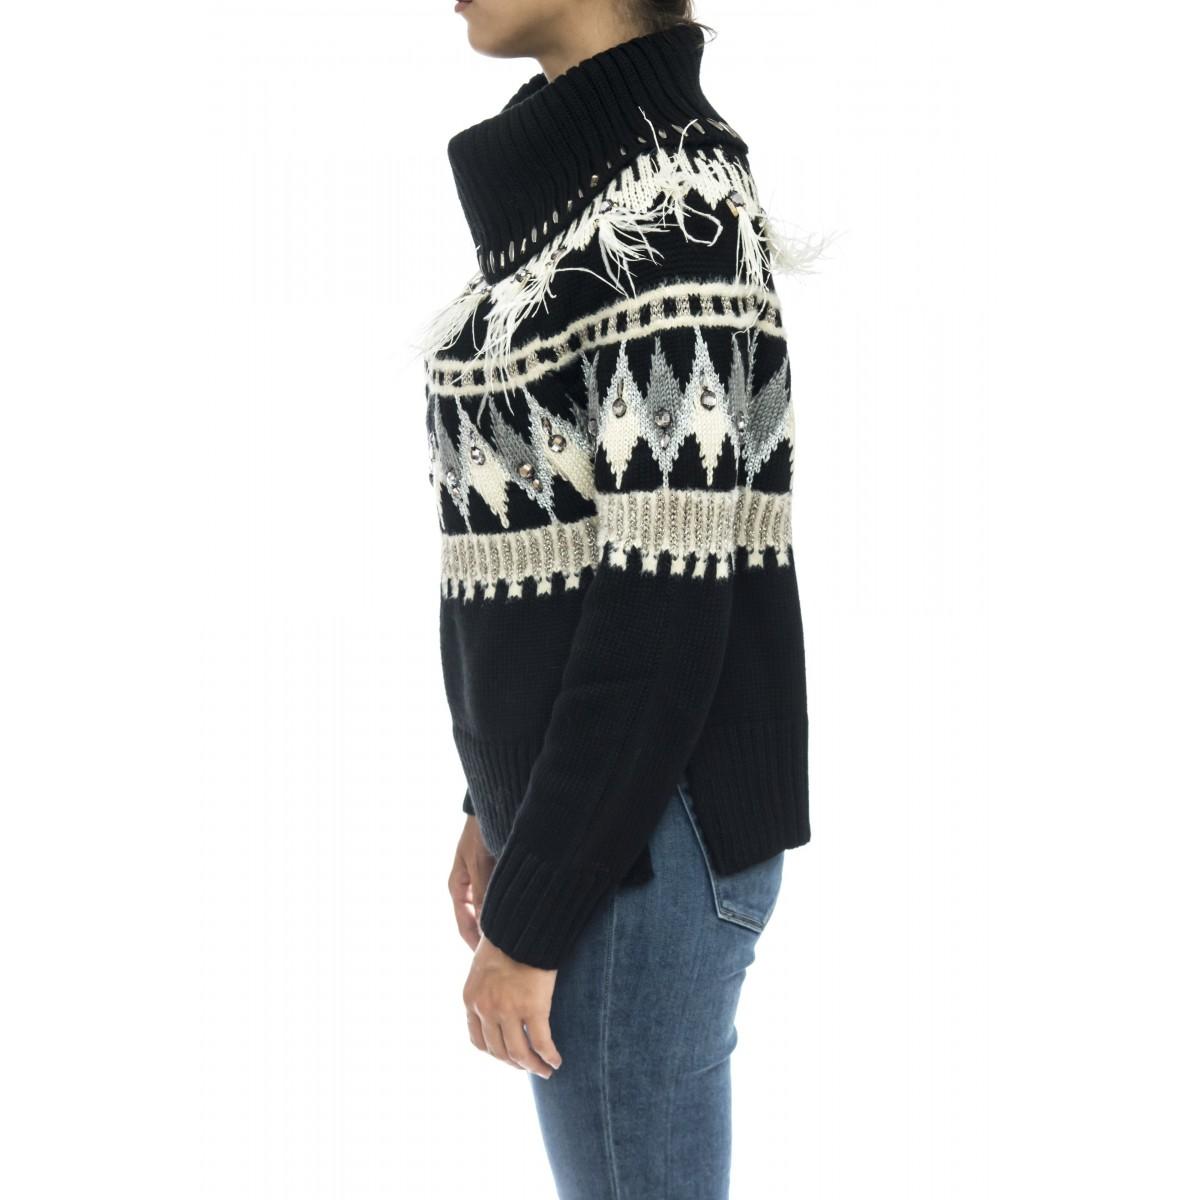 Maglieria - Tt3311 maglia ricamo swaroski piume marabu